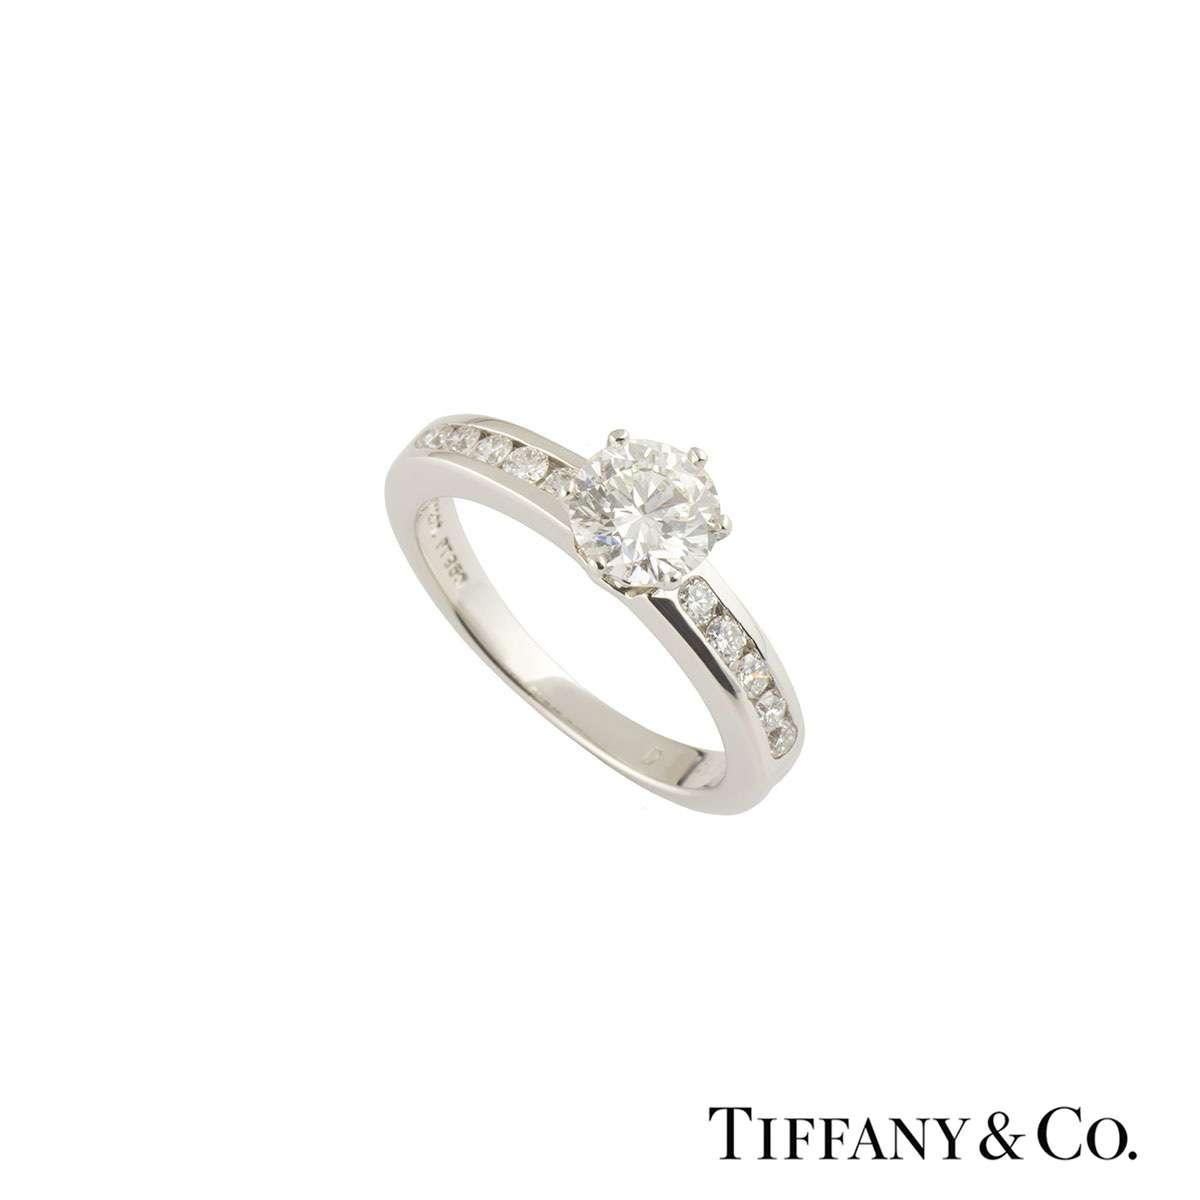 Tiffany & Co. The Tiffany Setting with Diamond Band Ring 0.76ct G/VS1